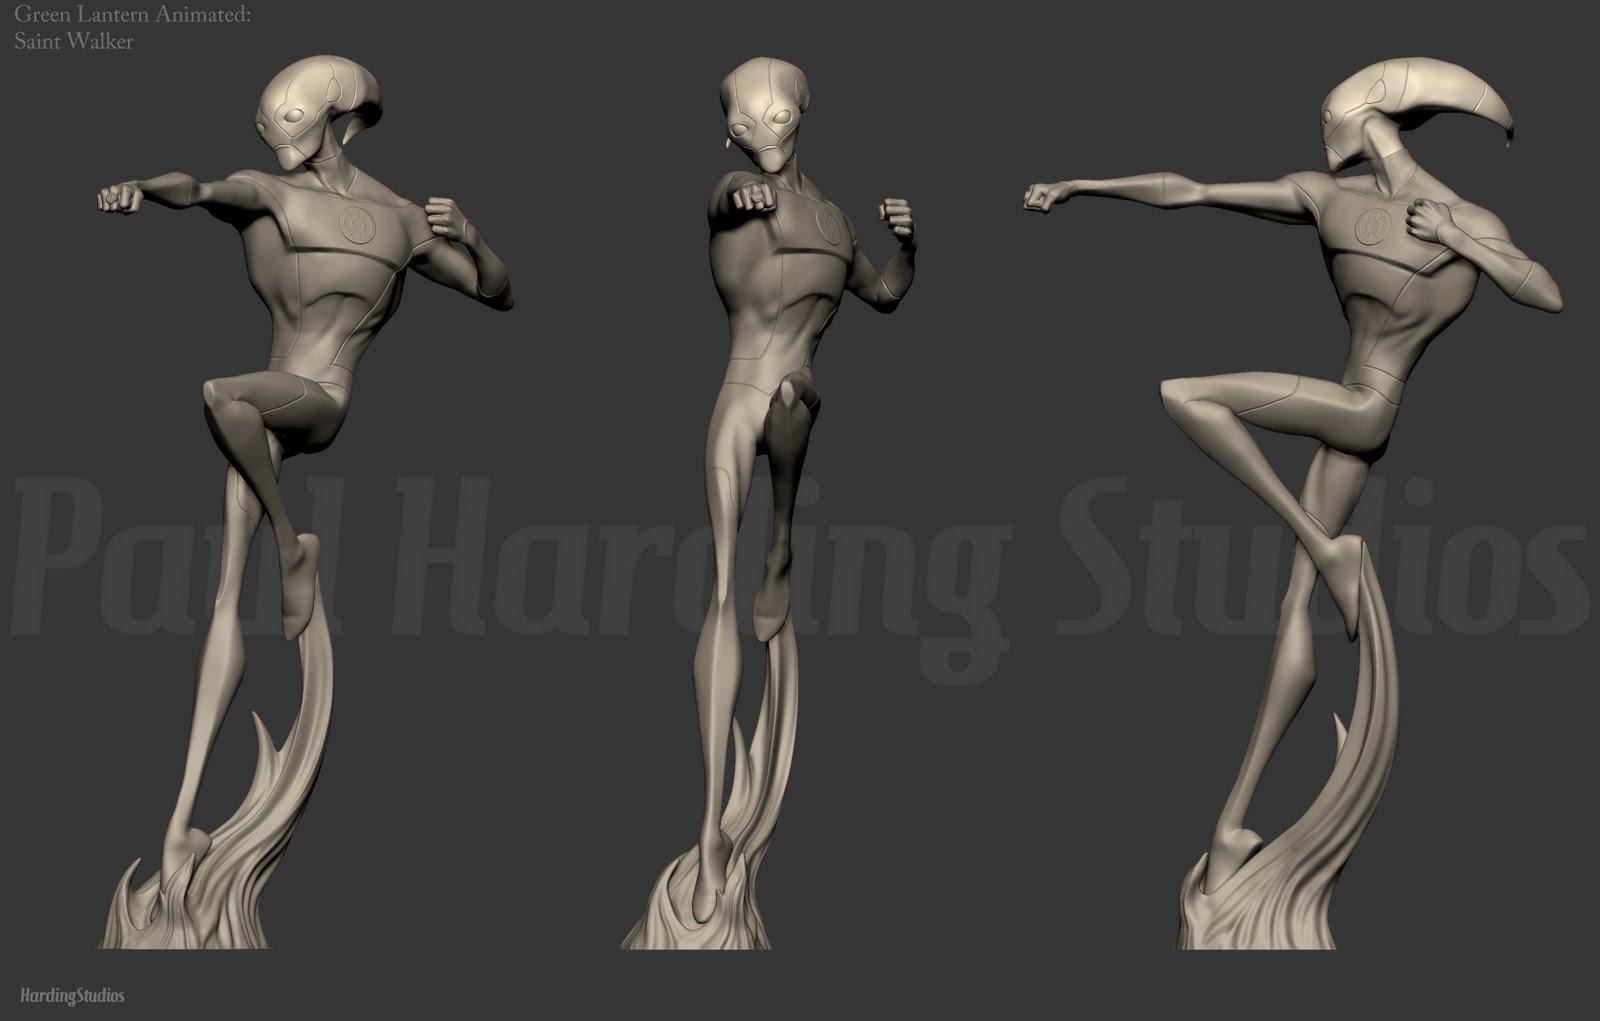 http://1.bp.blogspot.com/-WNoVY6HLJP0/TpxgjffpRqI/AAAAAAAAAsE/NQg53KjcPmk/s1600/GL_saintwalker_sculpt_01.jpg